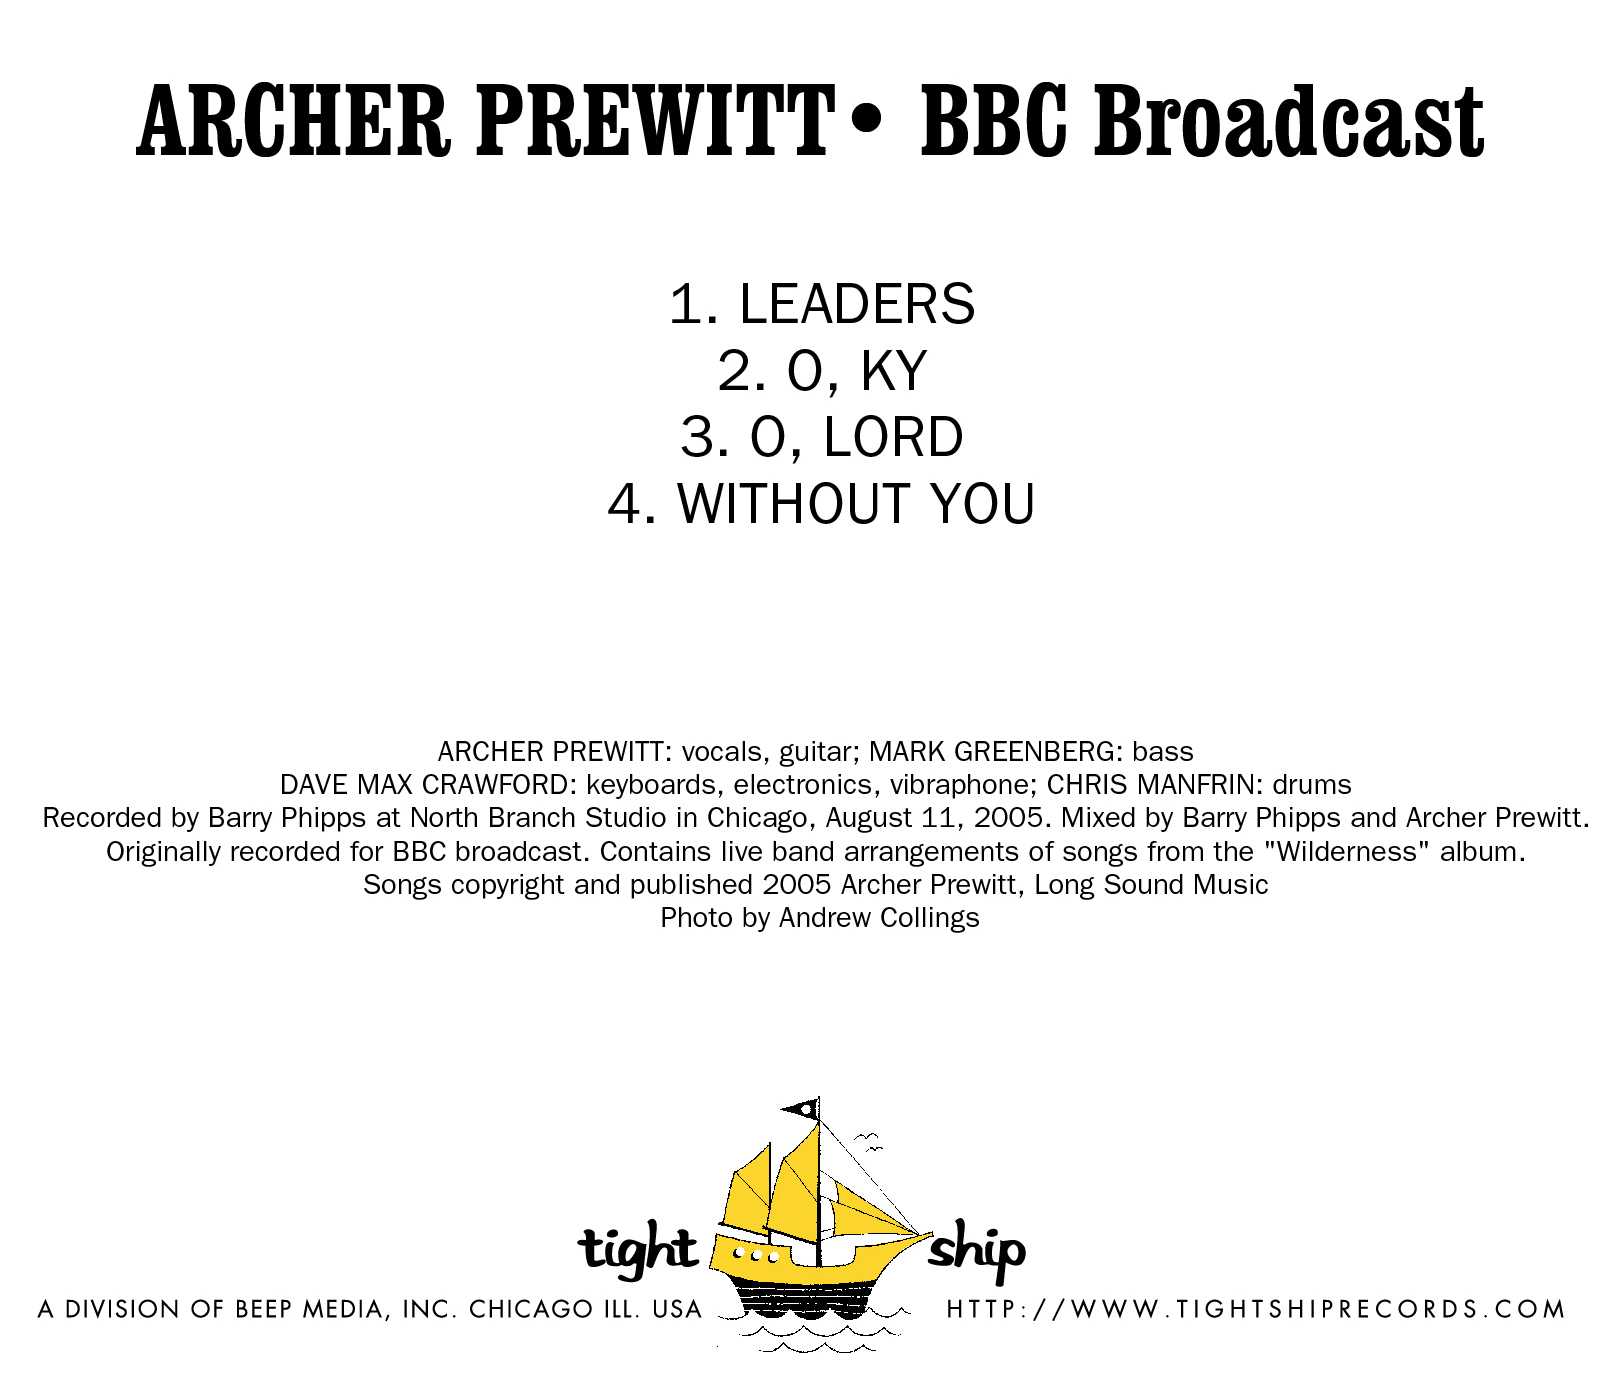 Archer Prewitt • BBC Broadcast.jpg